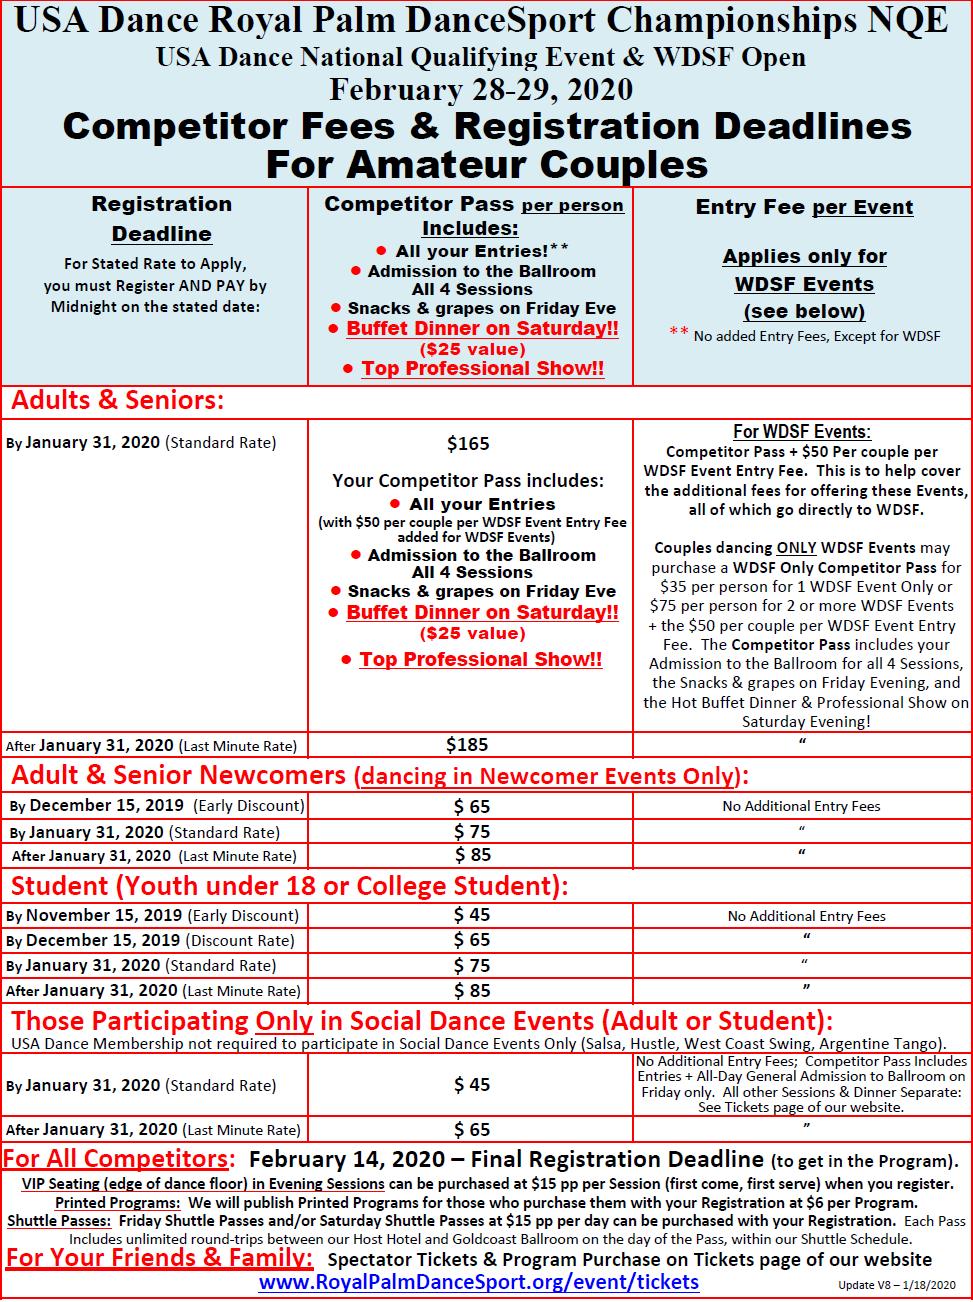 2020 Amateur Fees & Registration Deadlines